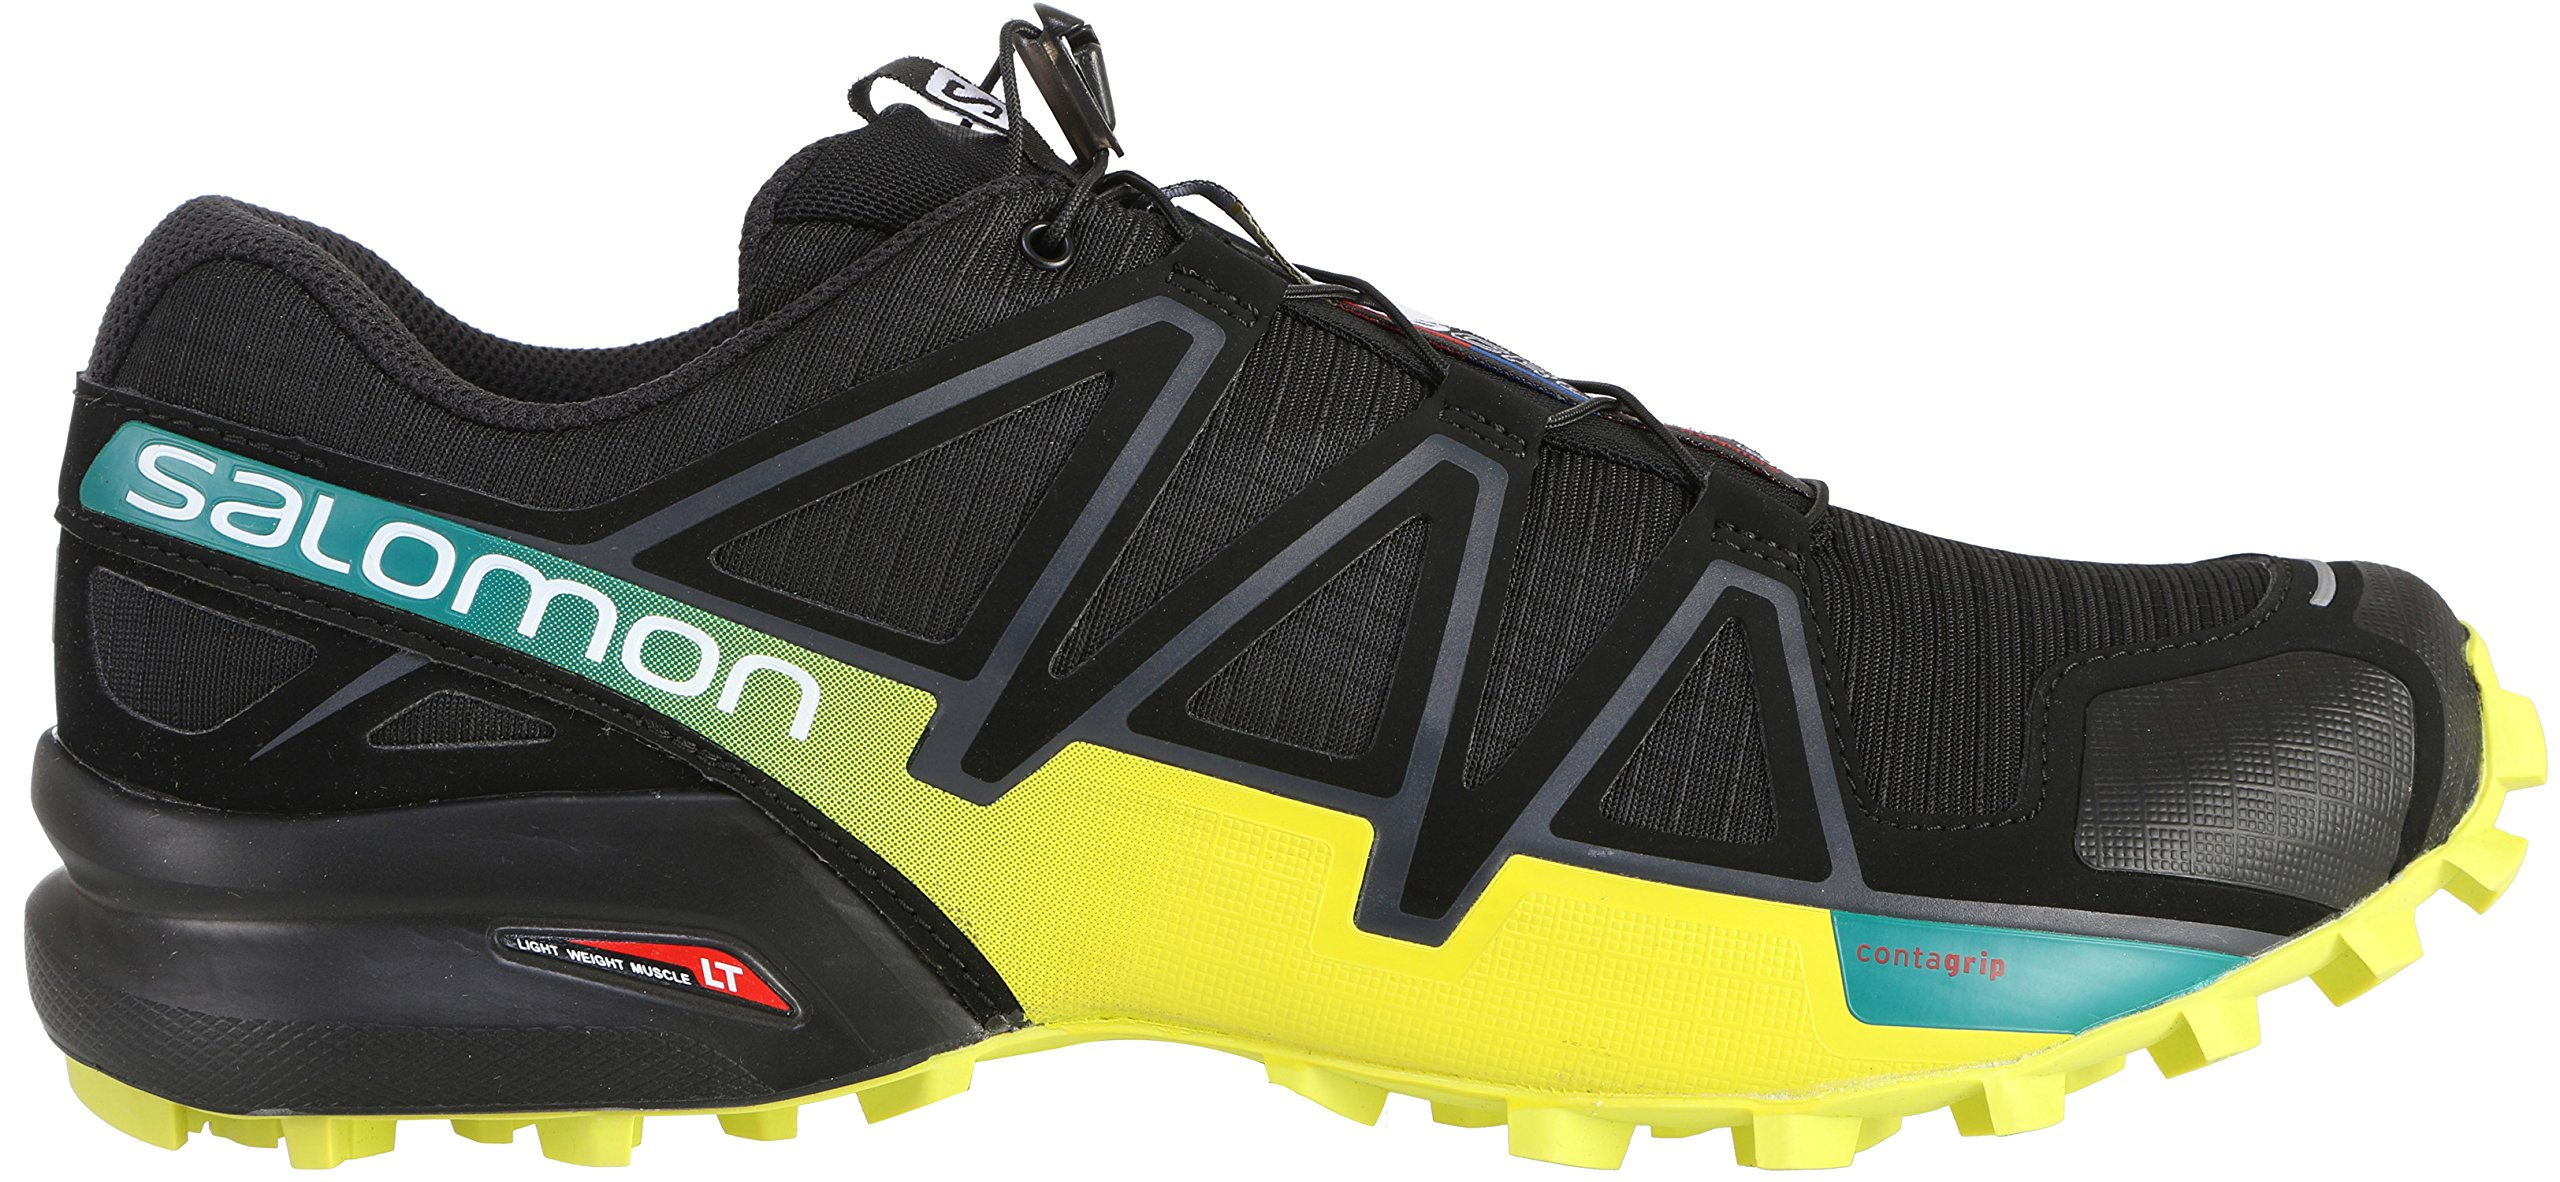 SALOMON Speedcross 4 Shoes Mens Sz 10 by SALOMON